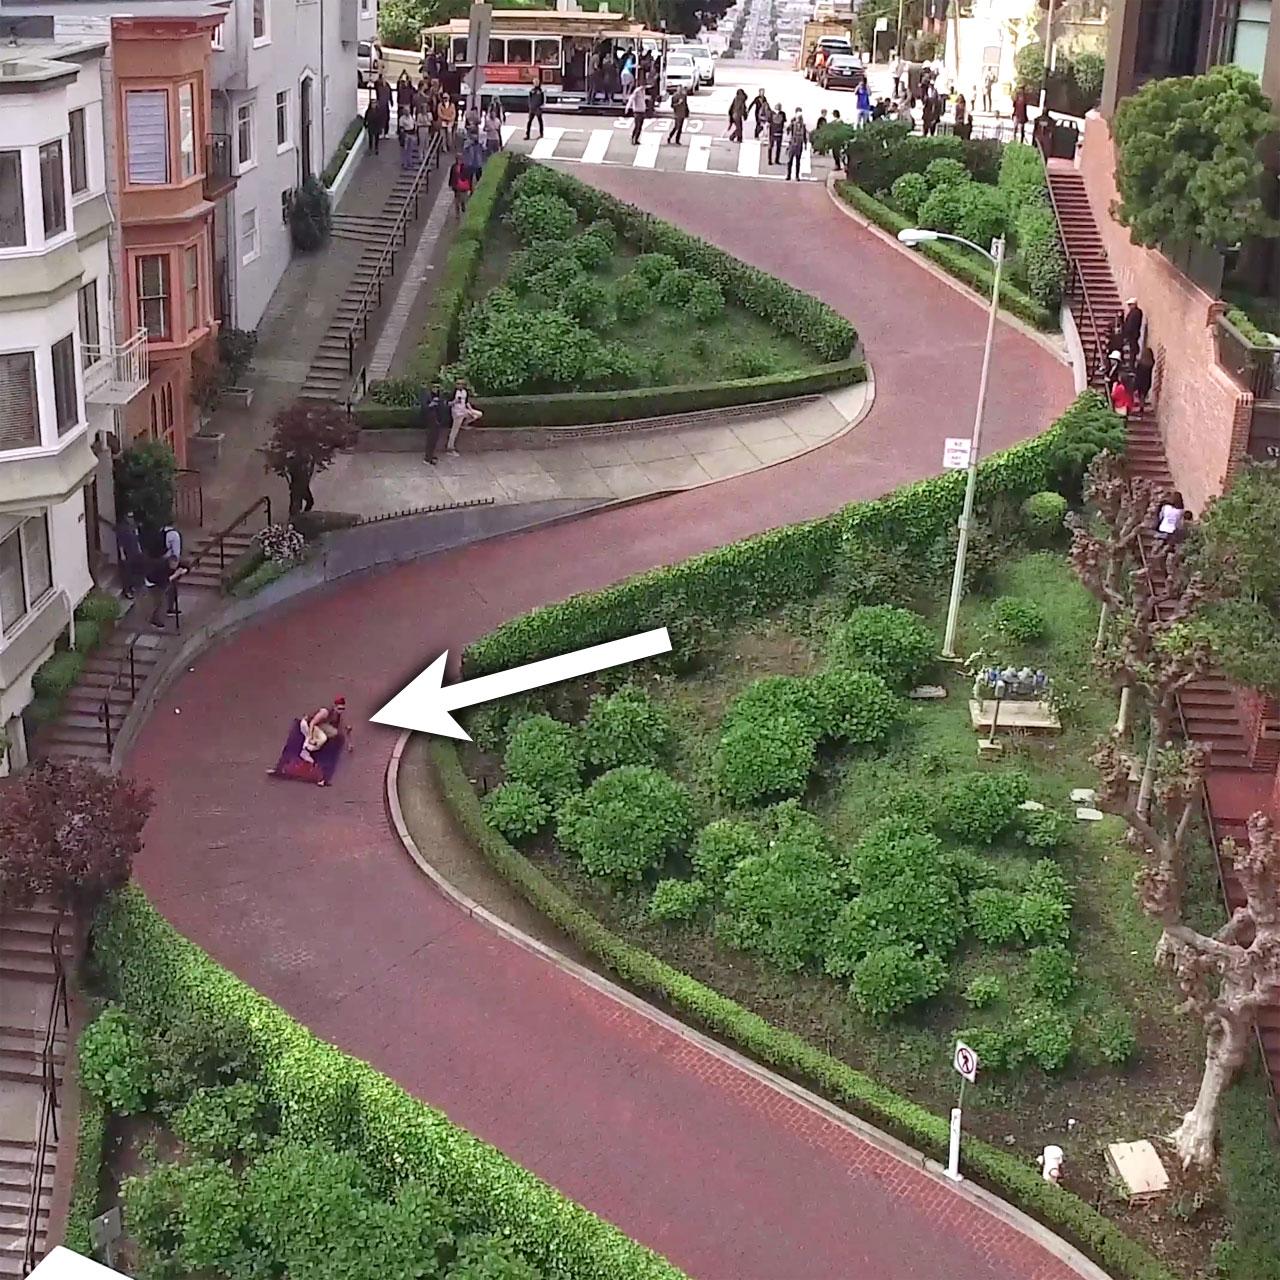 Jesse Wellens pulls Aladdin skateboard prank in San Francisco